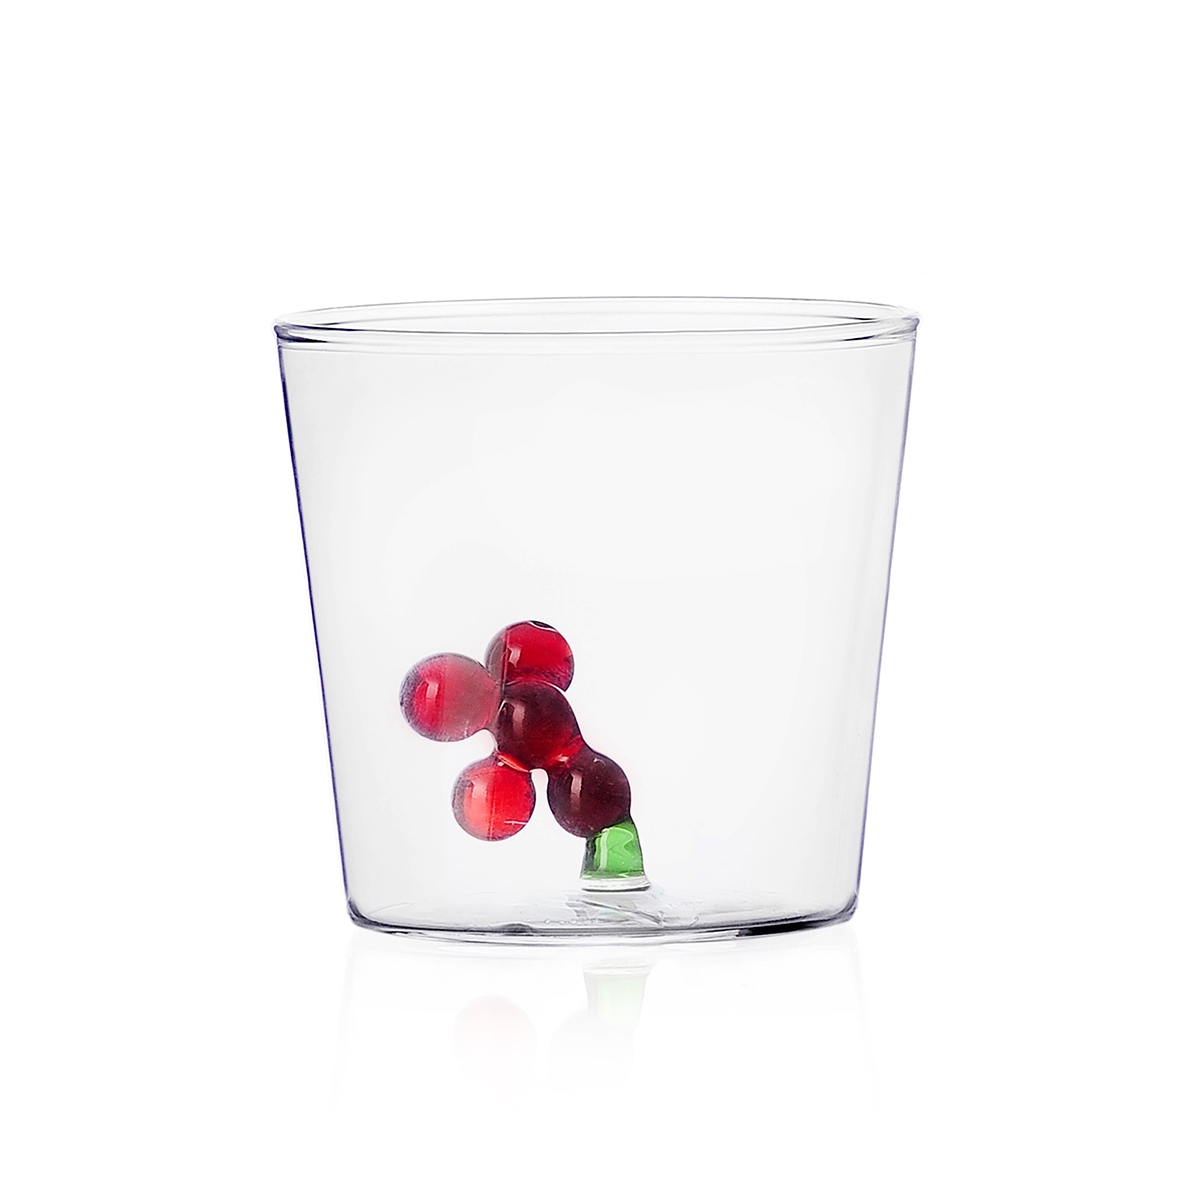 Red berries tumbler glass by Ichendorf Milano